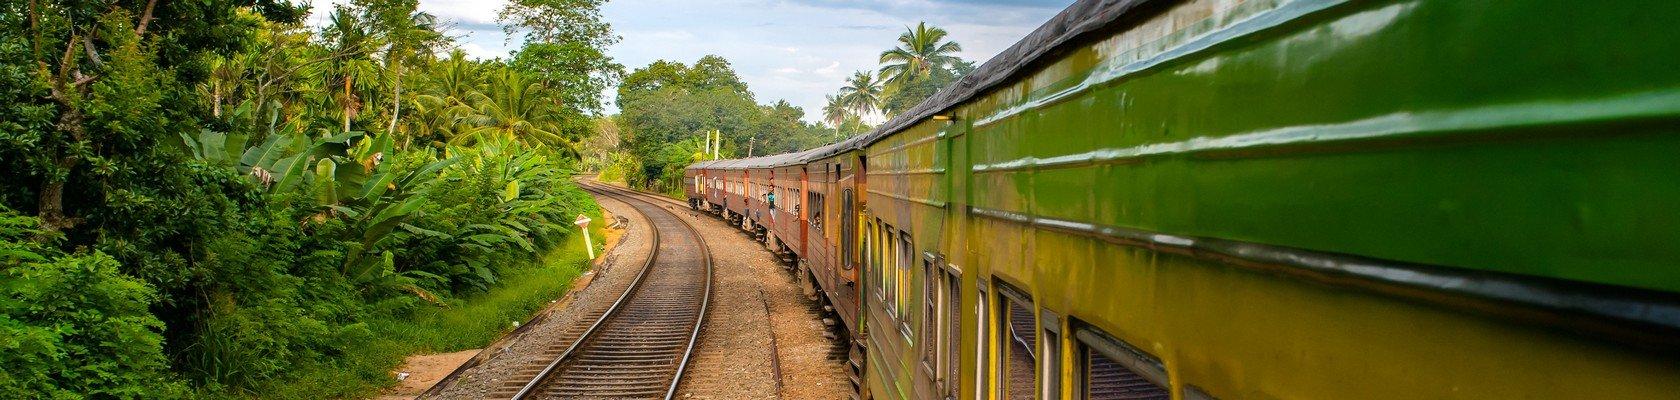 Mooie treinreis naar Ajmer